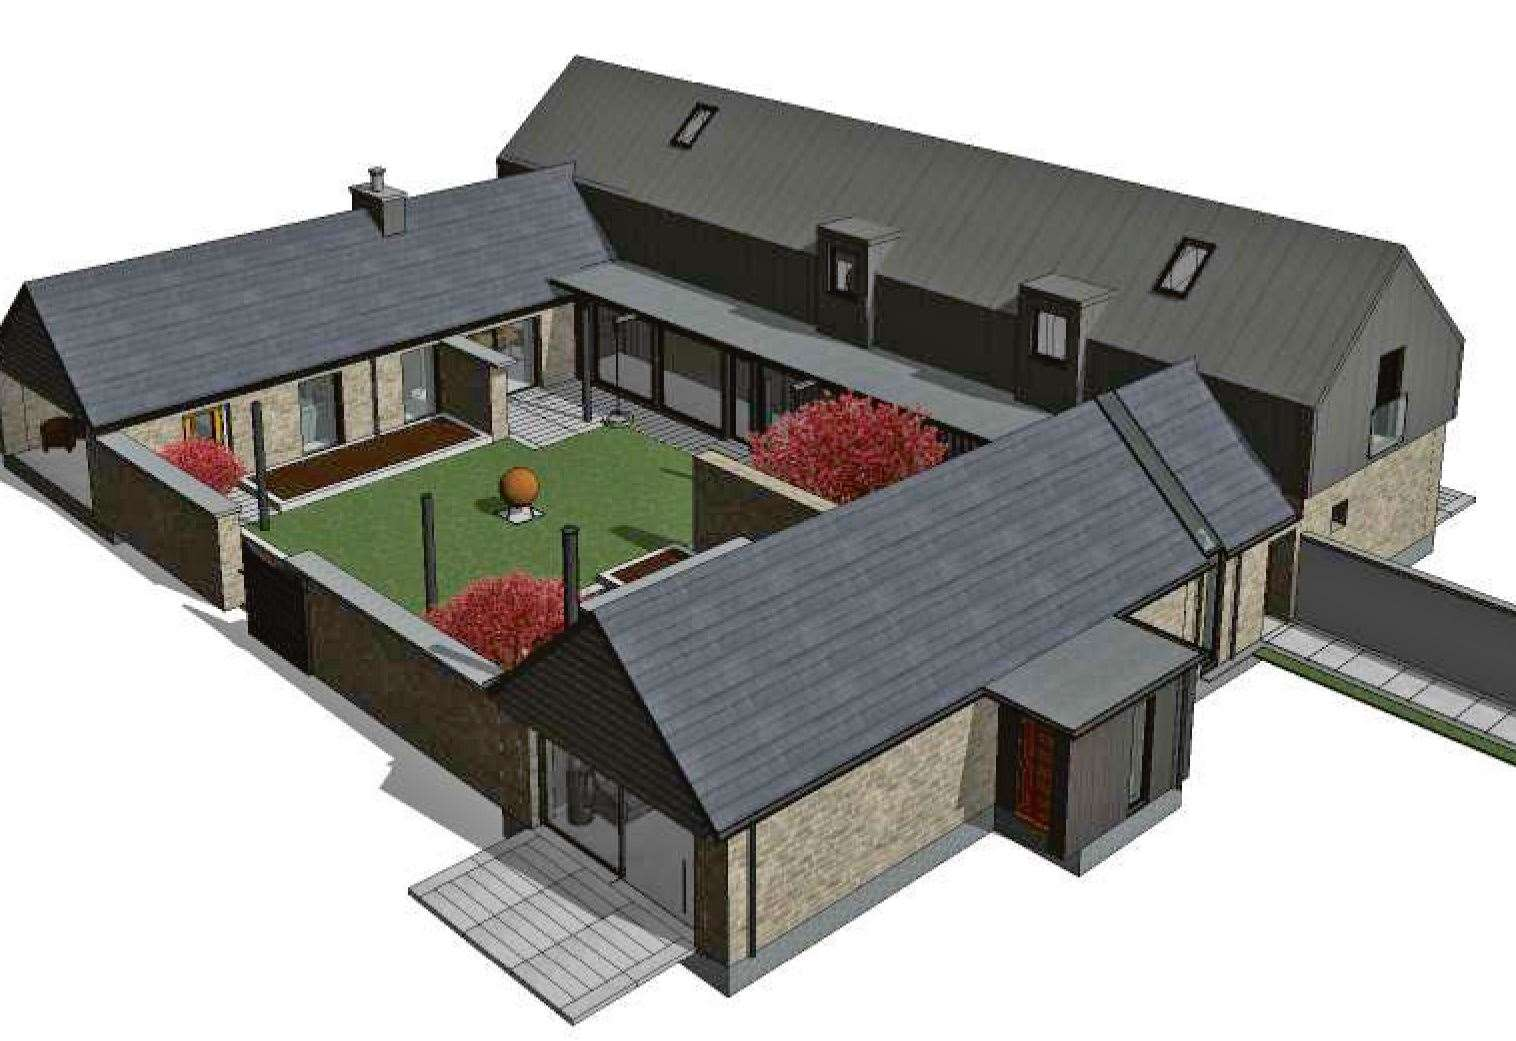 Culloden home bid sparks anger